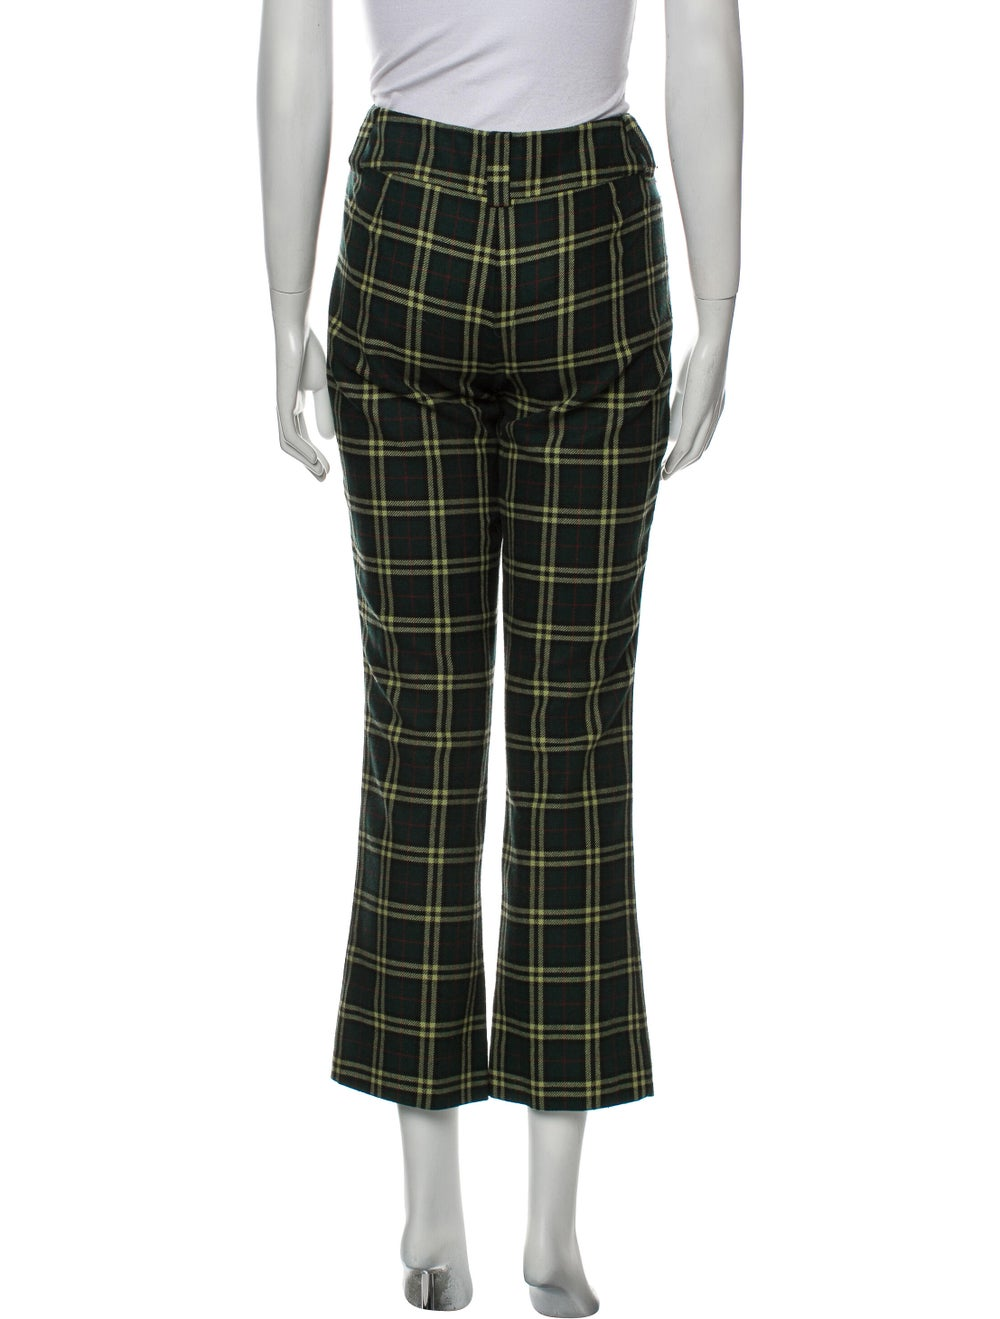 D&G Plaid Print Straight Leg Pants Green - image 3